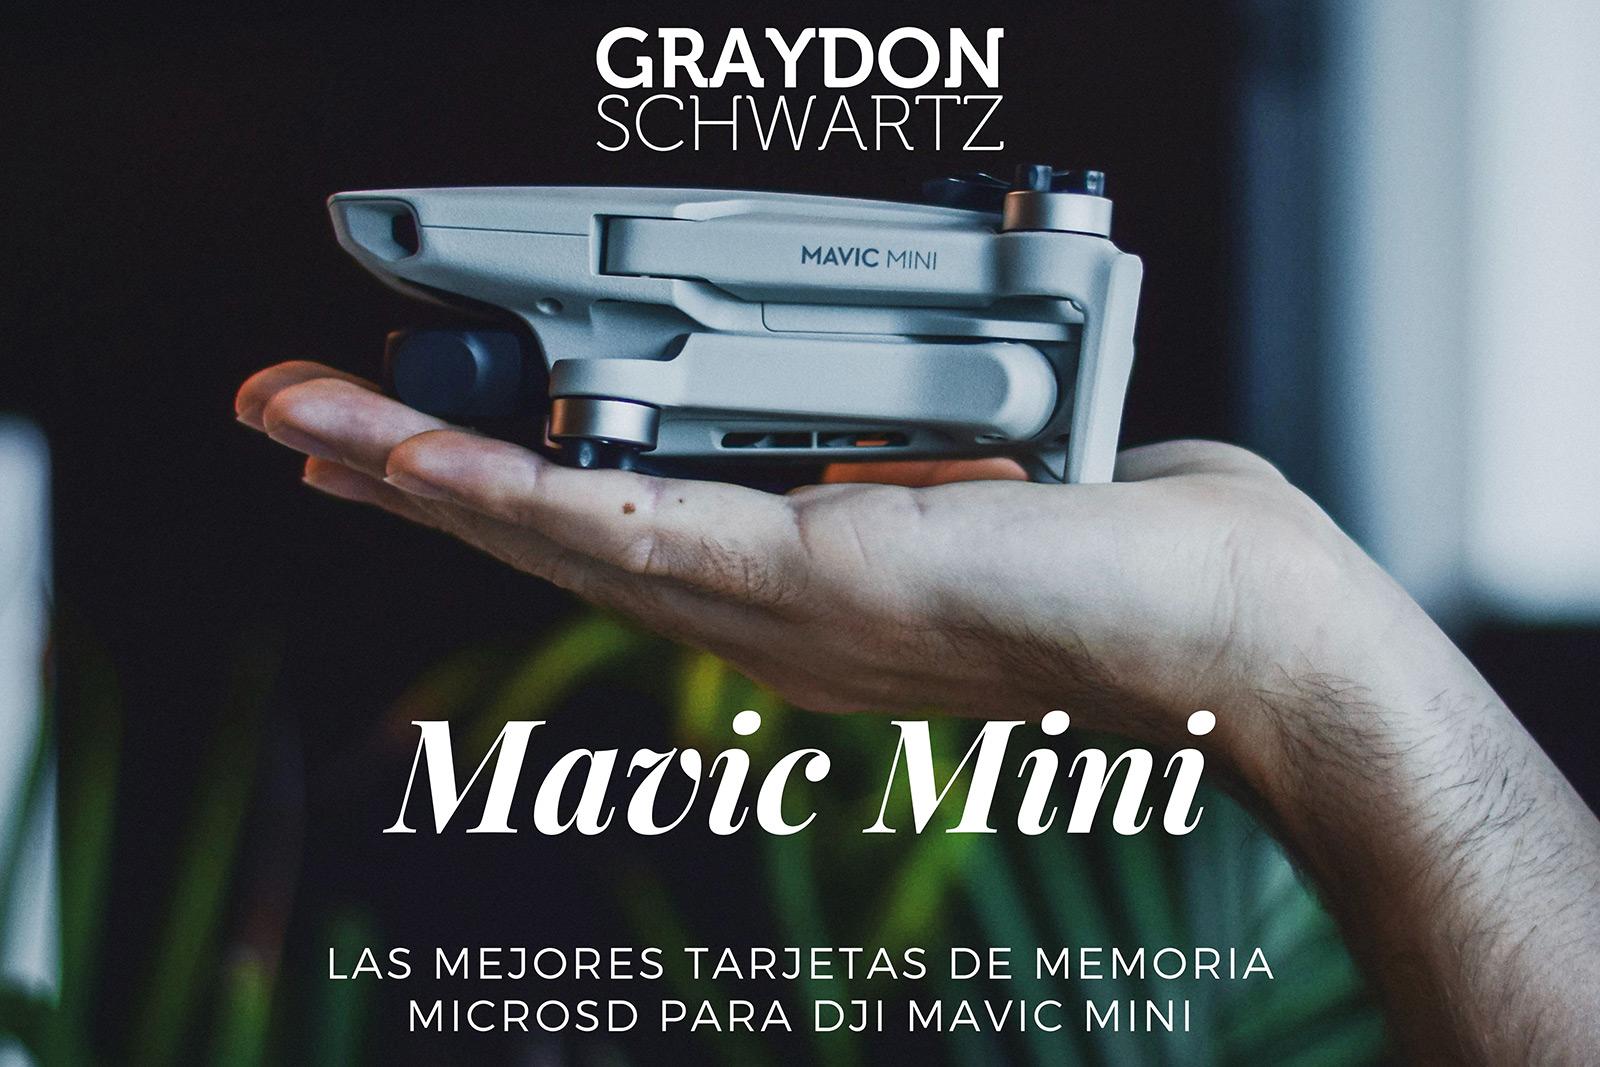 Dron Ultraligero y Port/átil DJI Mavic Mini Tarjeta de Memoria microSDXC de 64/GB con Adaptador SD Care Refresh DJI Mavic Mini SanDisk Extreme